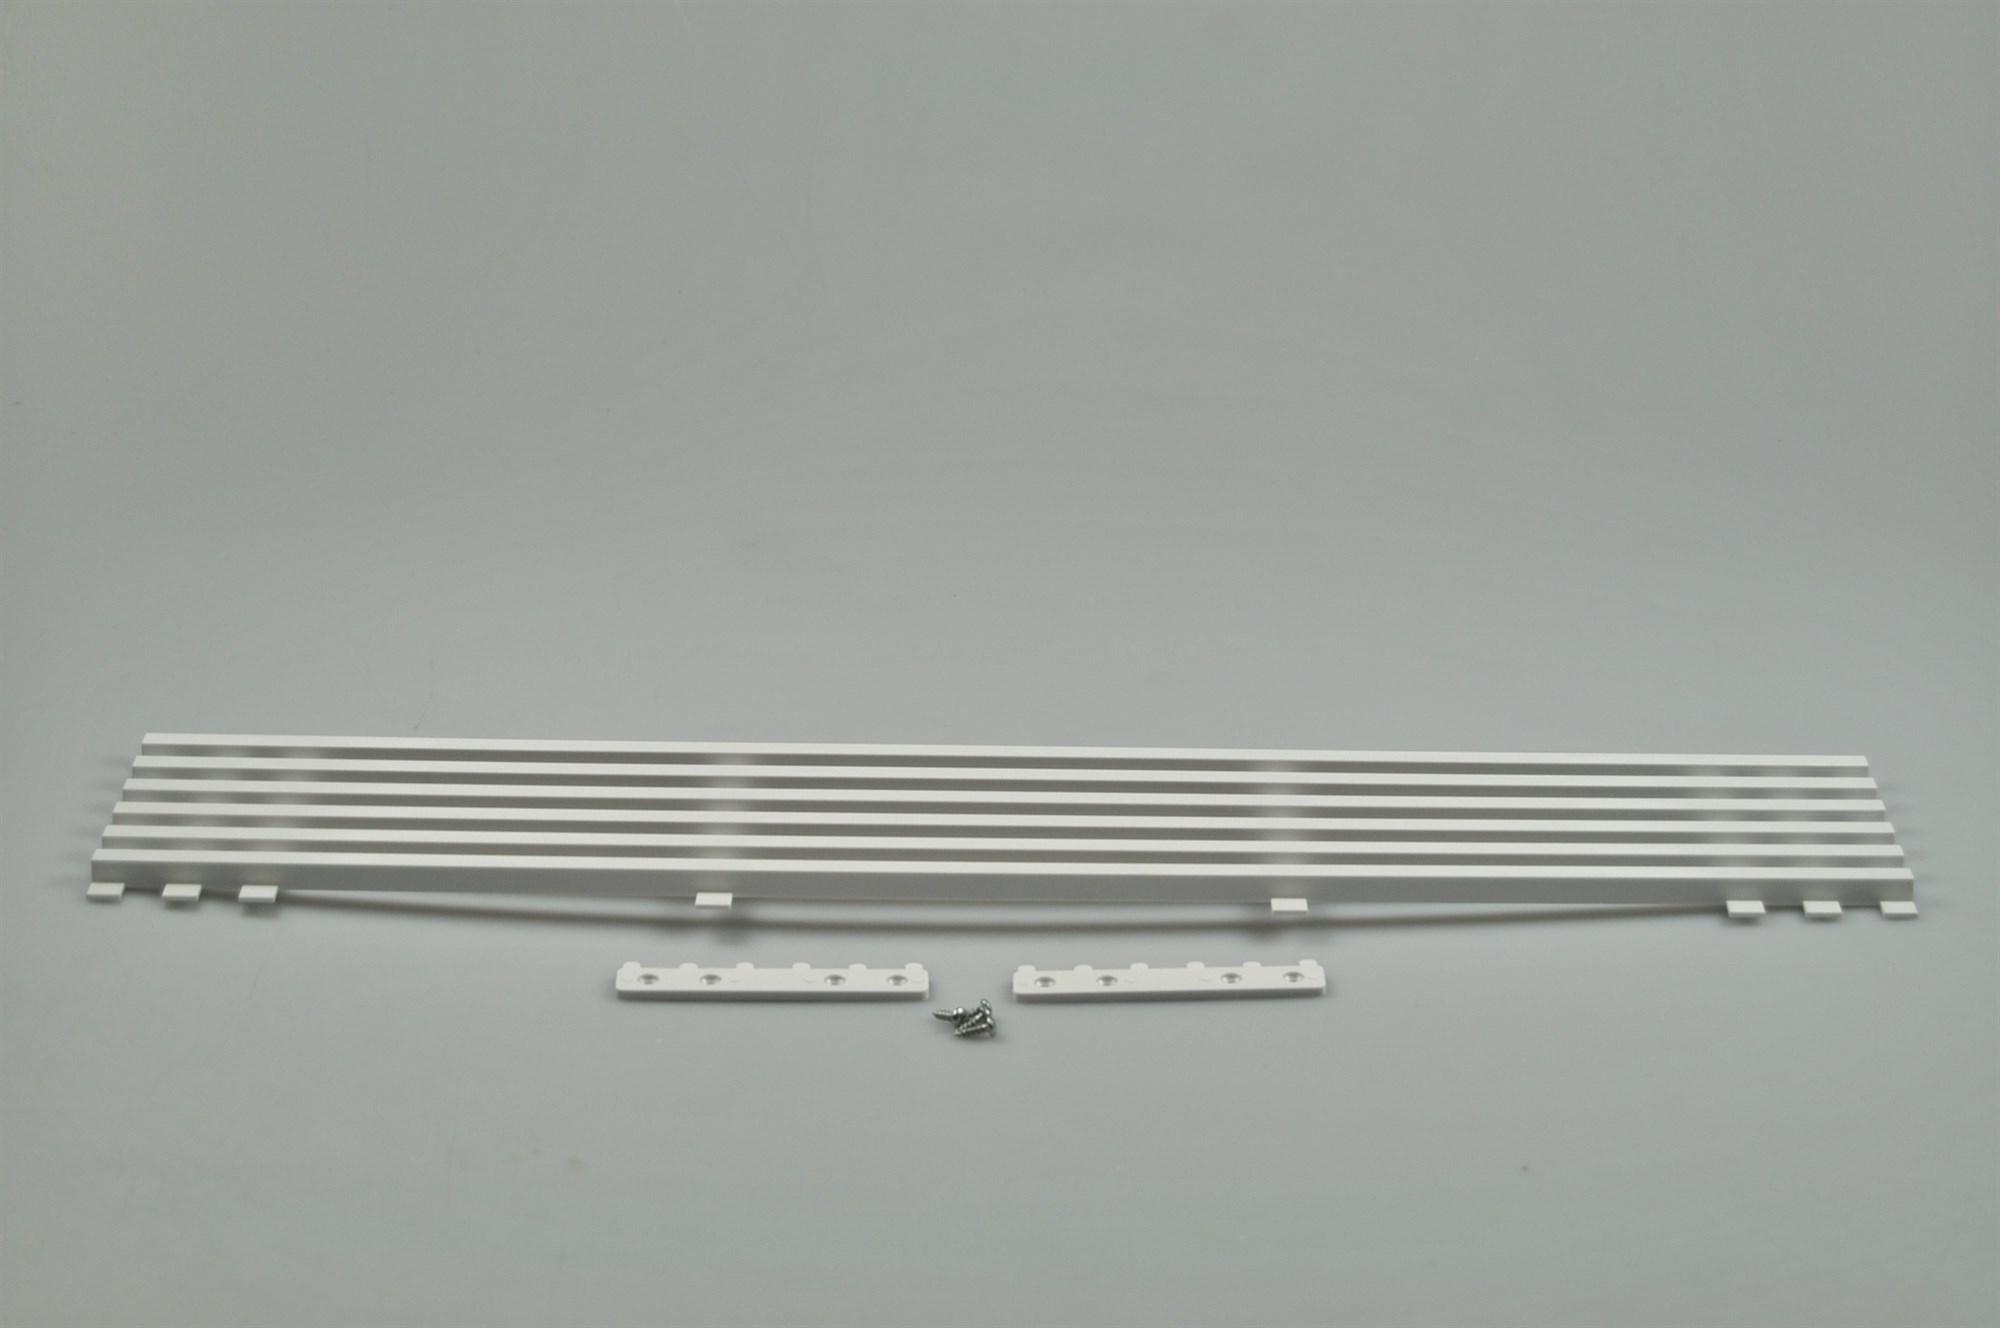 Side By Side Kühlschrank Braun : Lüftungsgitter universal side by side kühlschrank